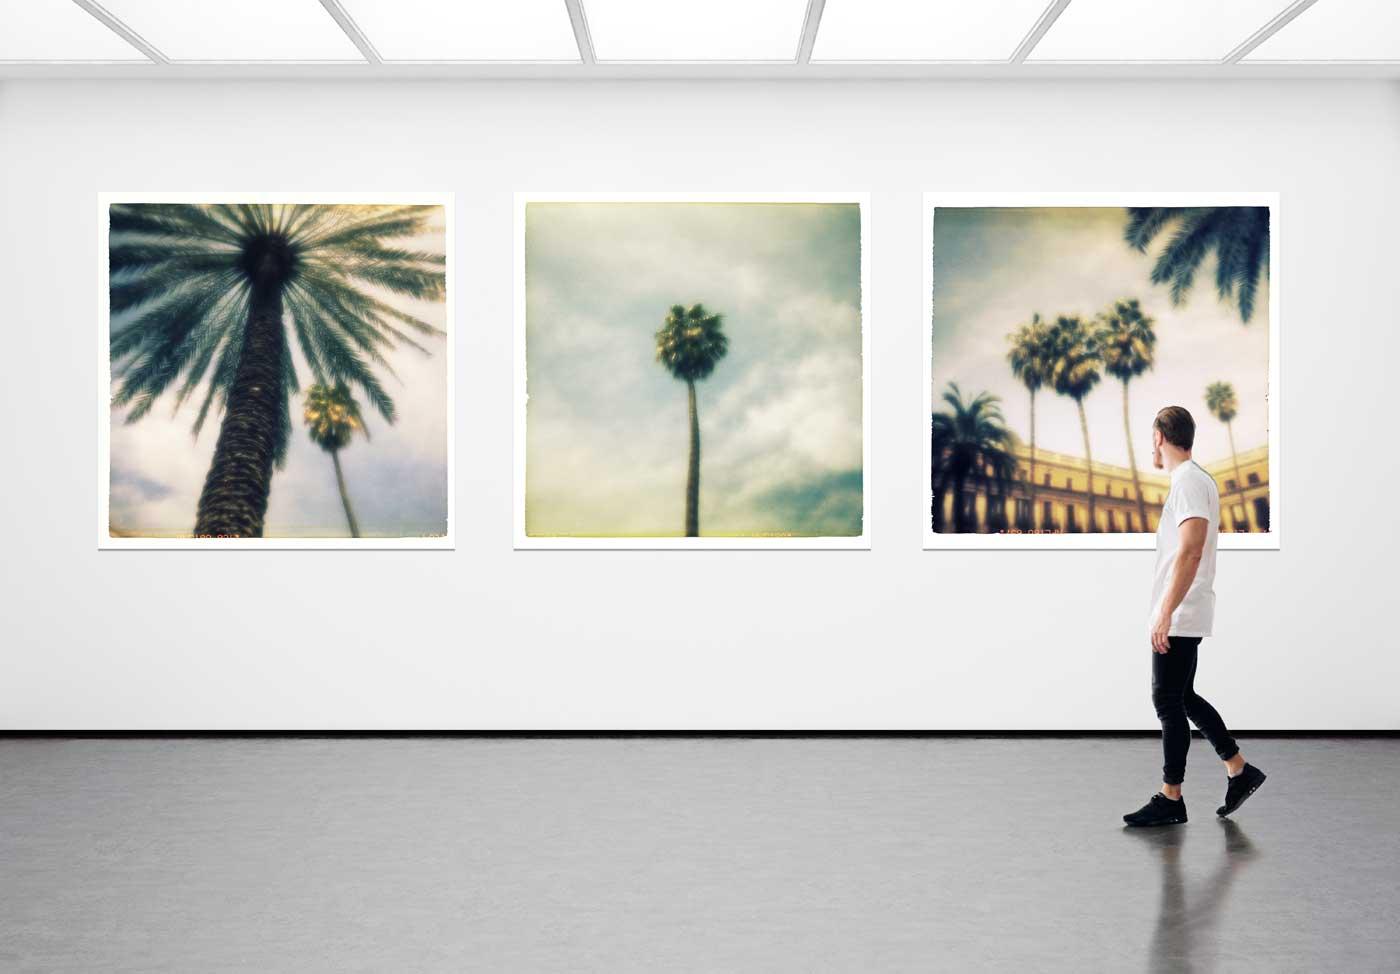 Decoracion, interior, hotel, fotografia